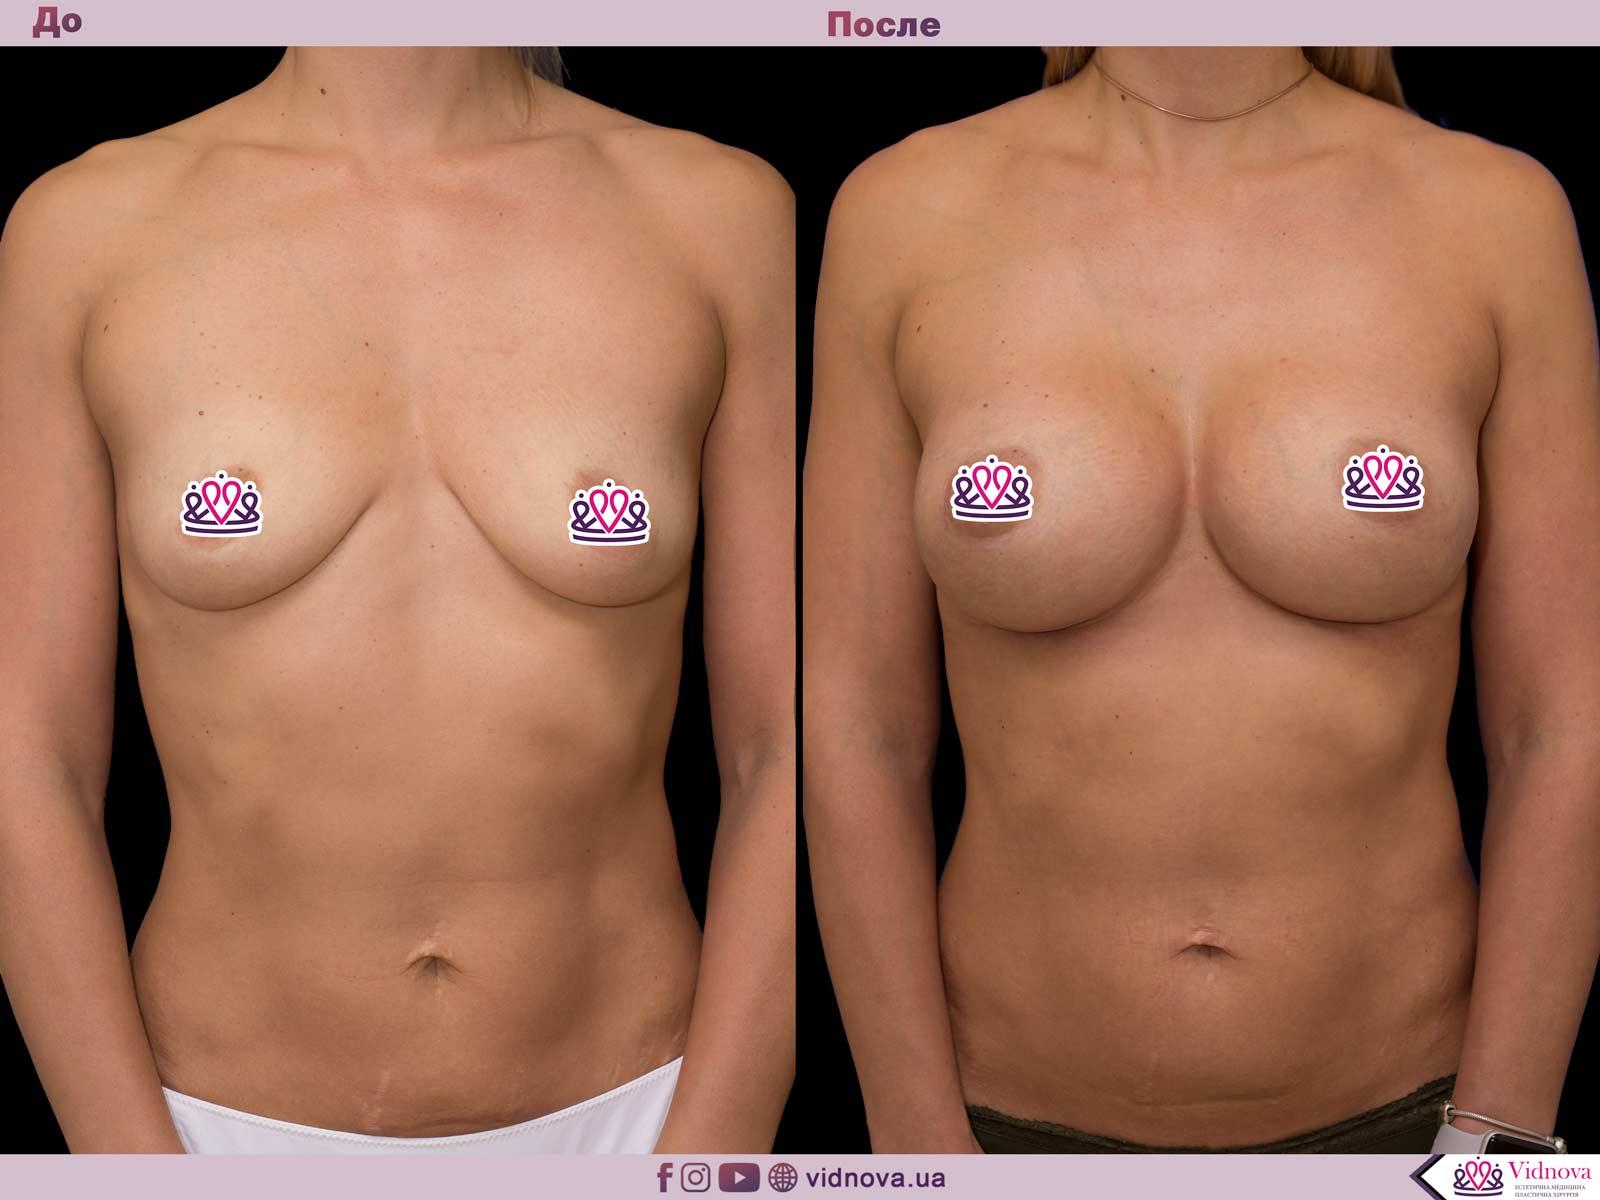 Увеличение груди: Фото ДО и ПОСЛЕ - Пример №41-1 - Клиника Vidnova